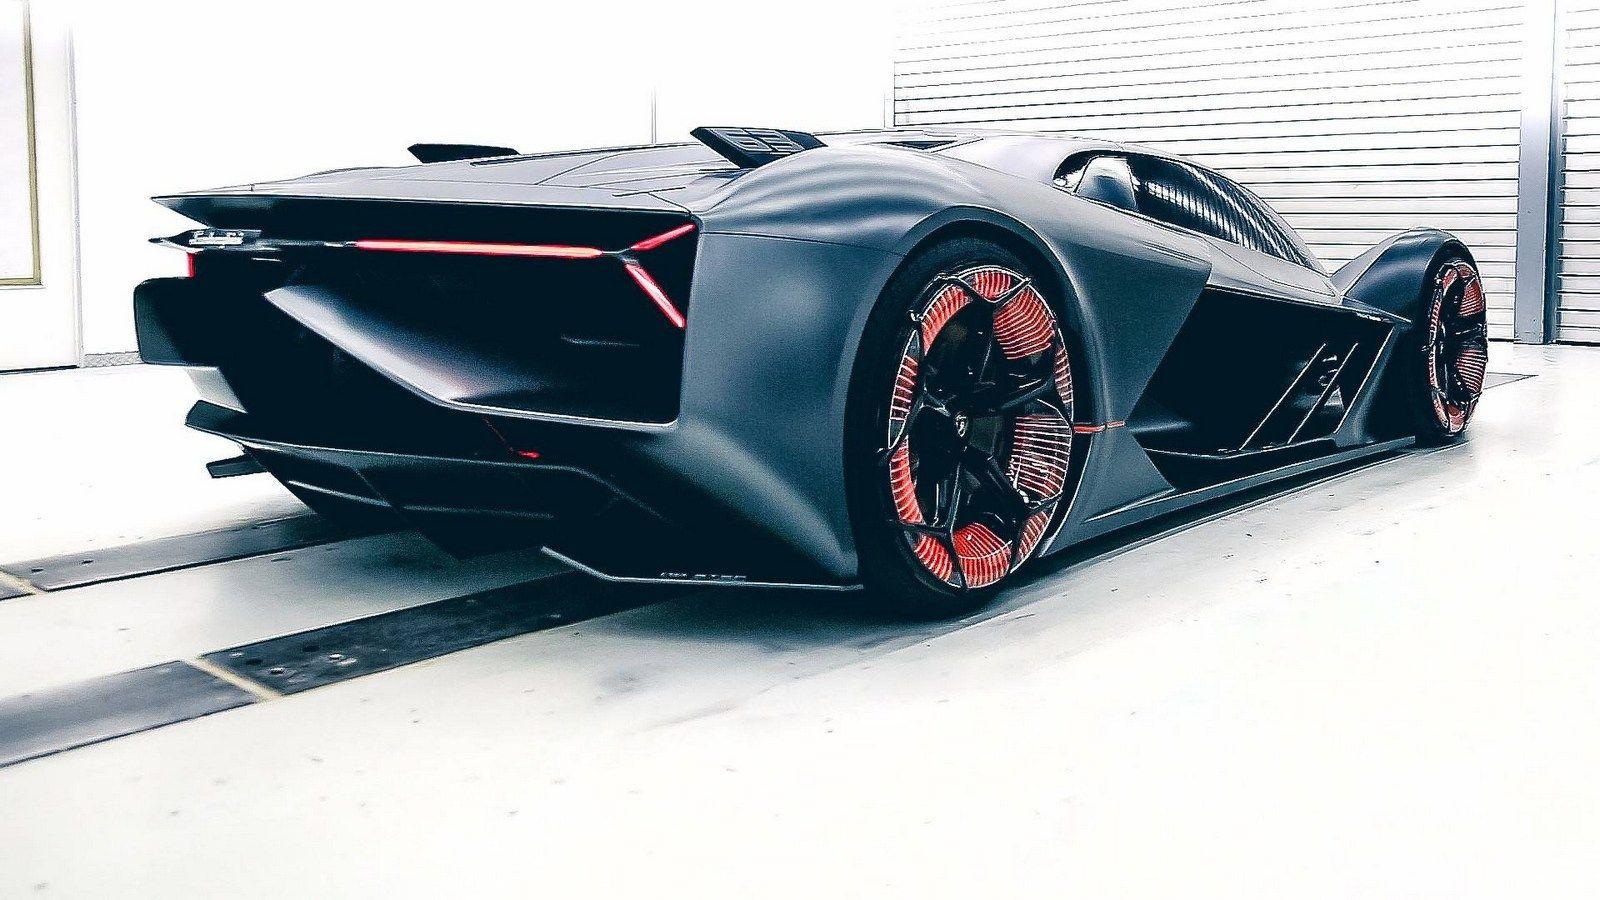 Lamborghini Terzo Millennio Autos Pinterest Lamborghini - Current sports cars